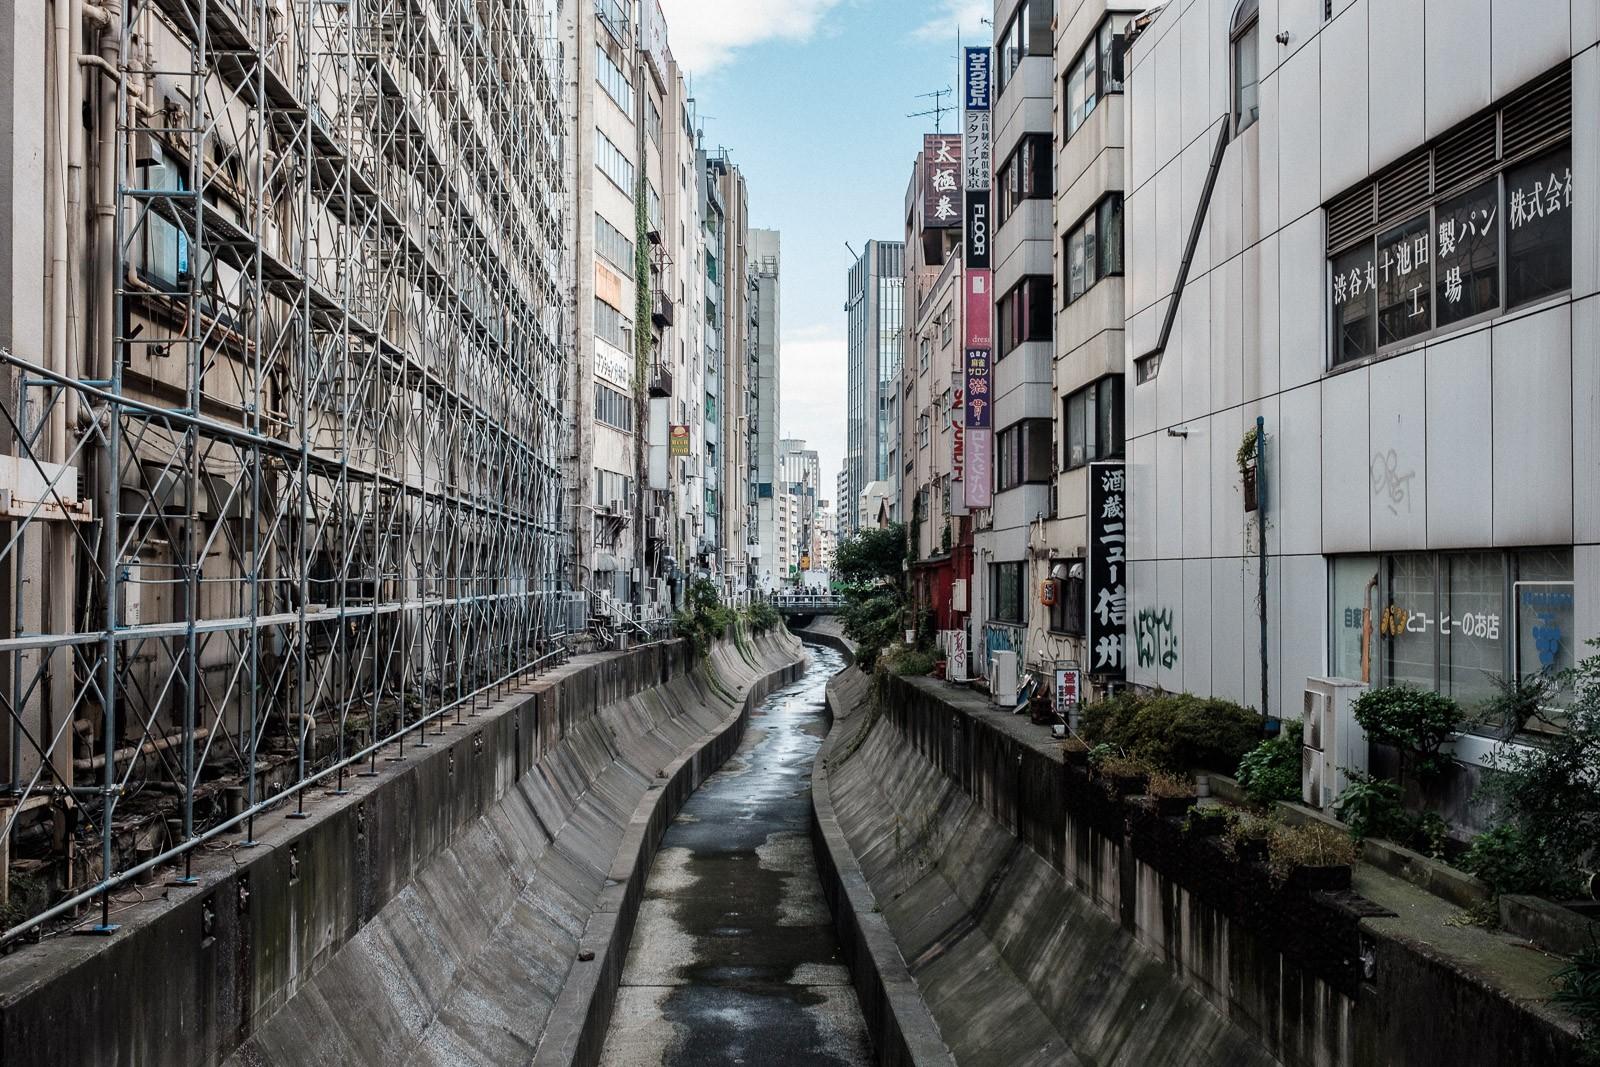 shibuya river construction site